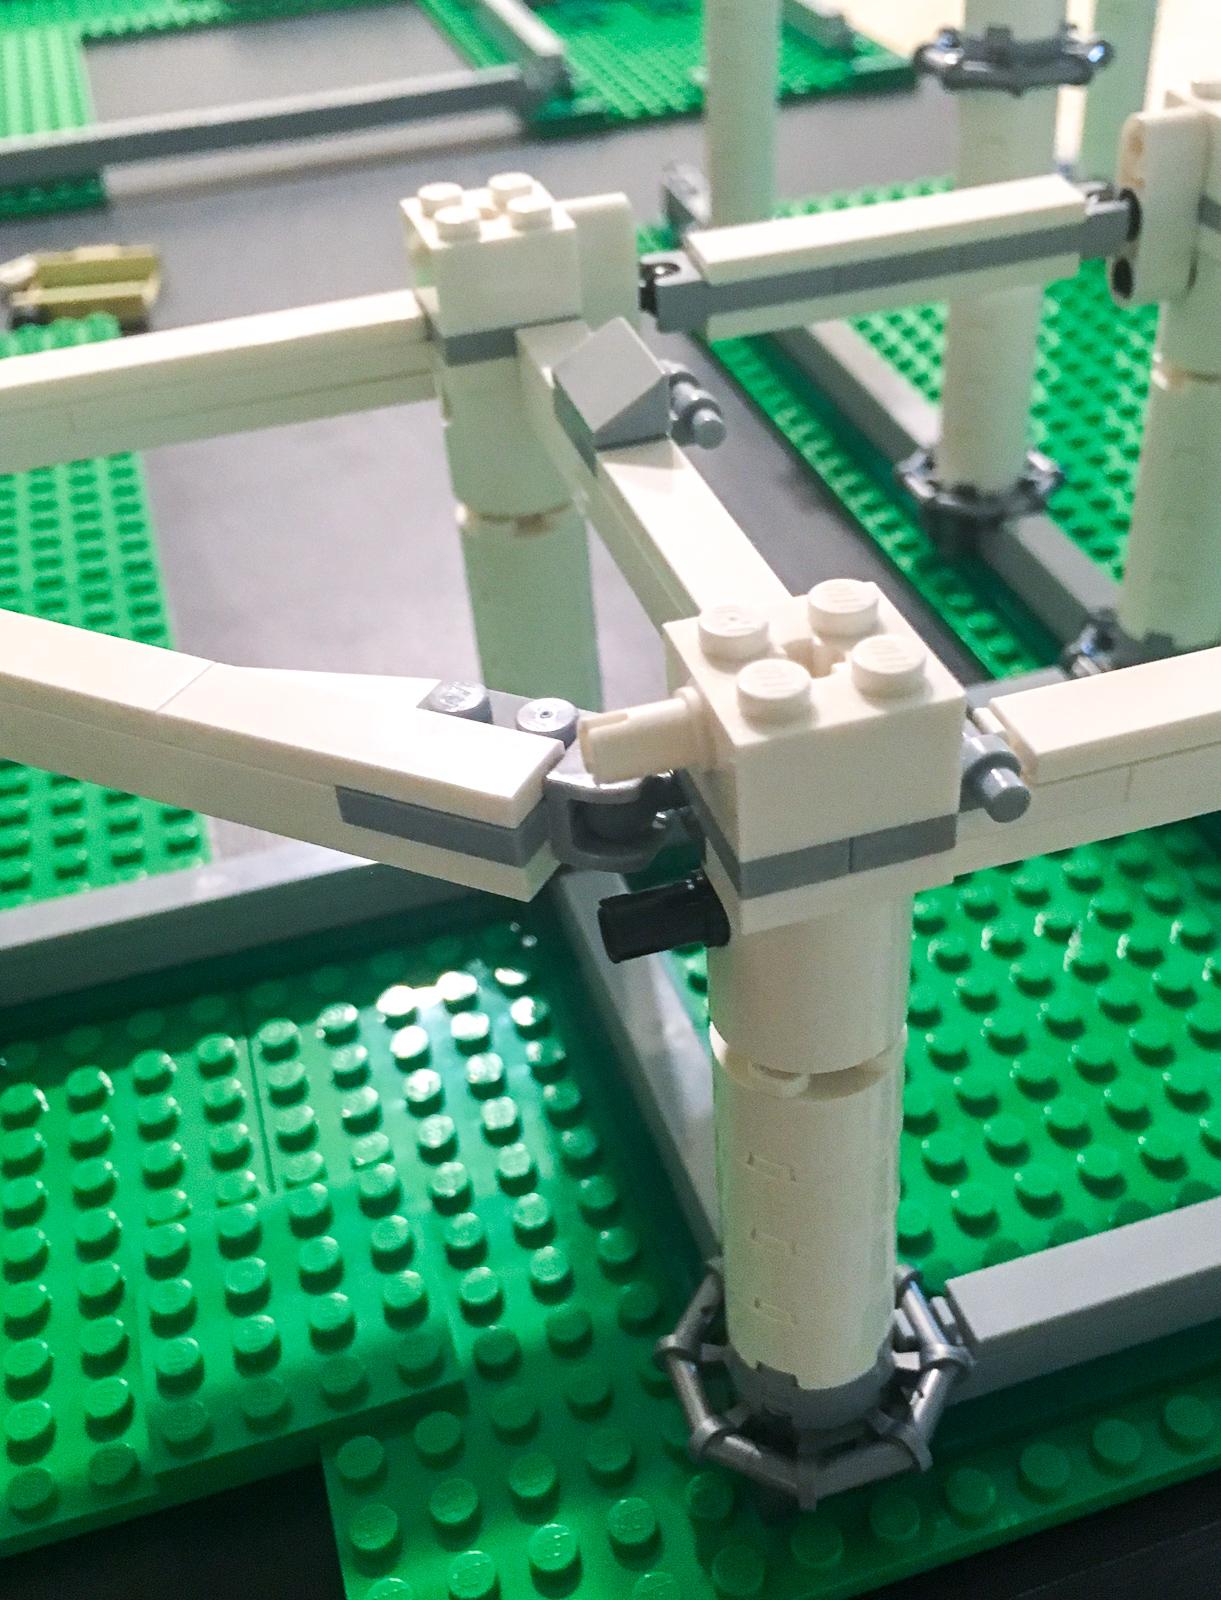 10261 Roller Coaster Brick Architect